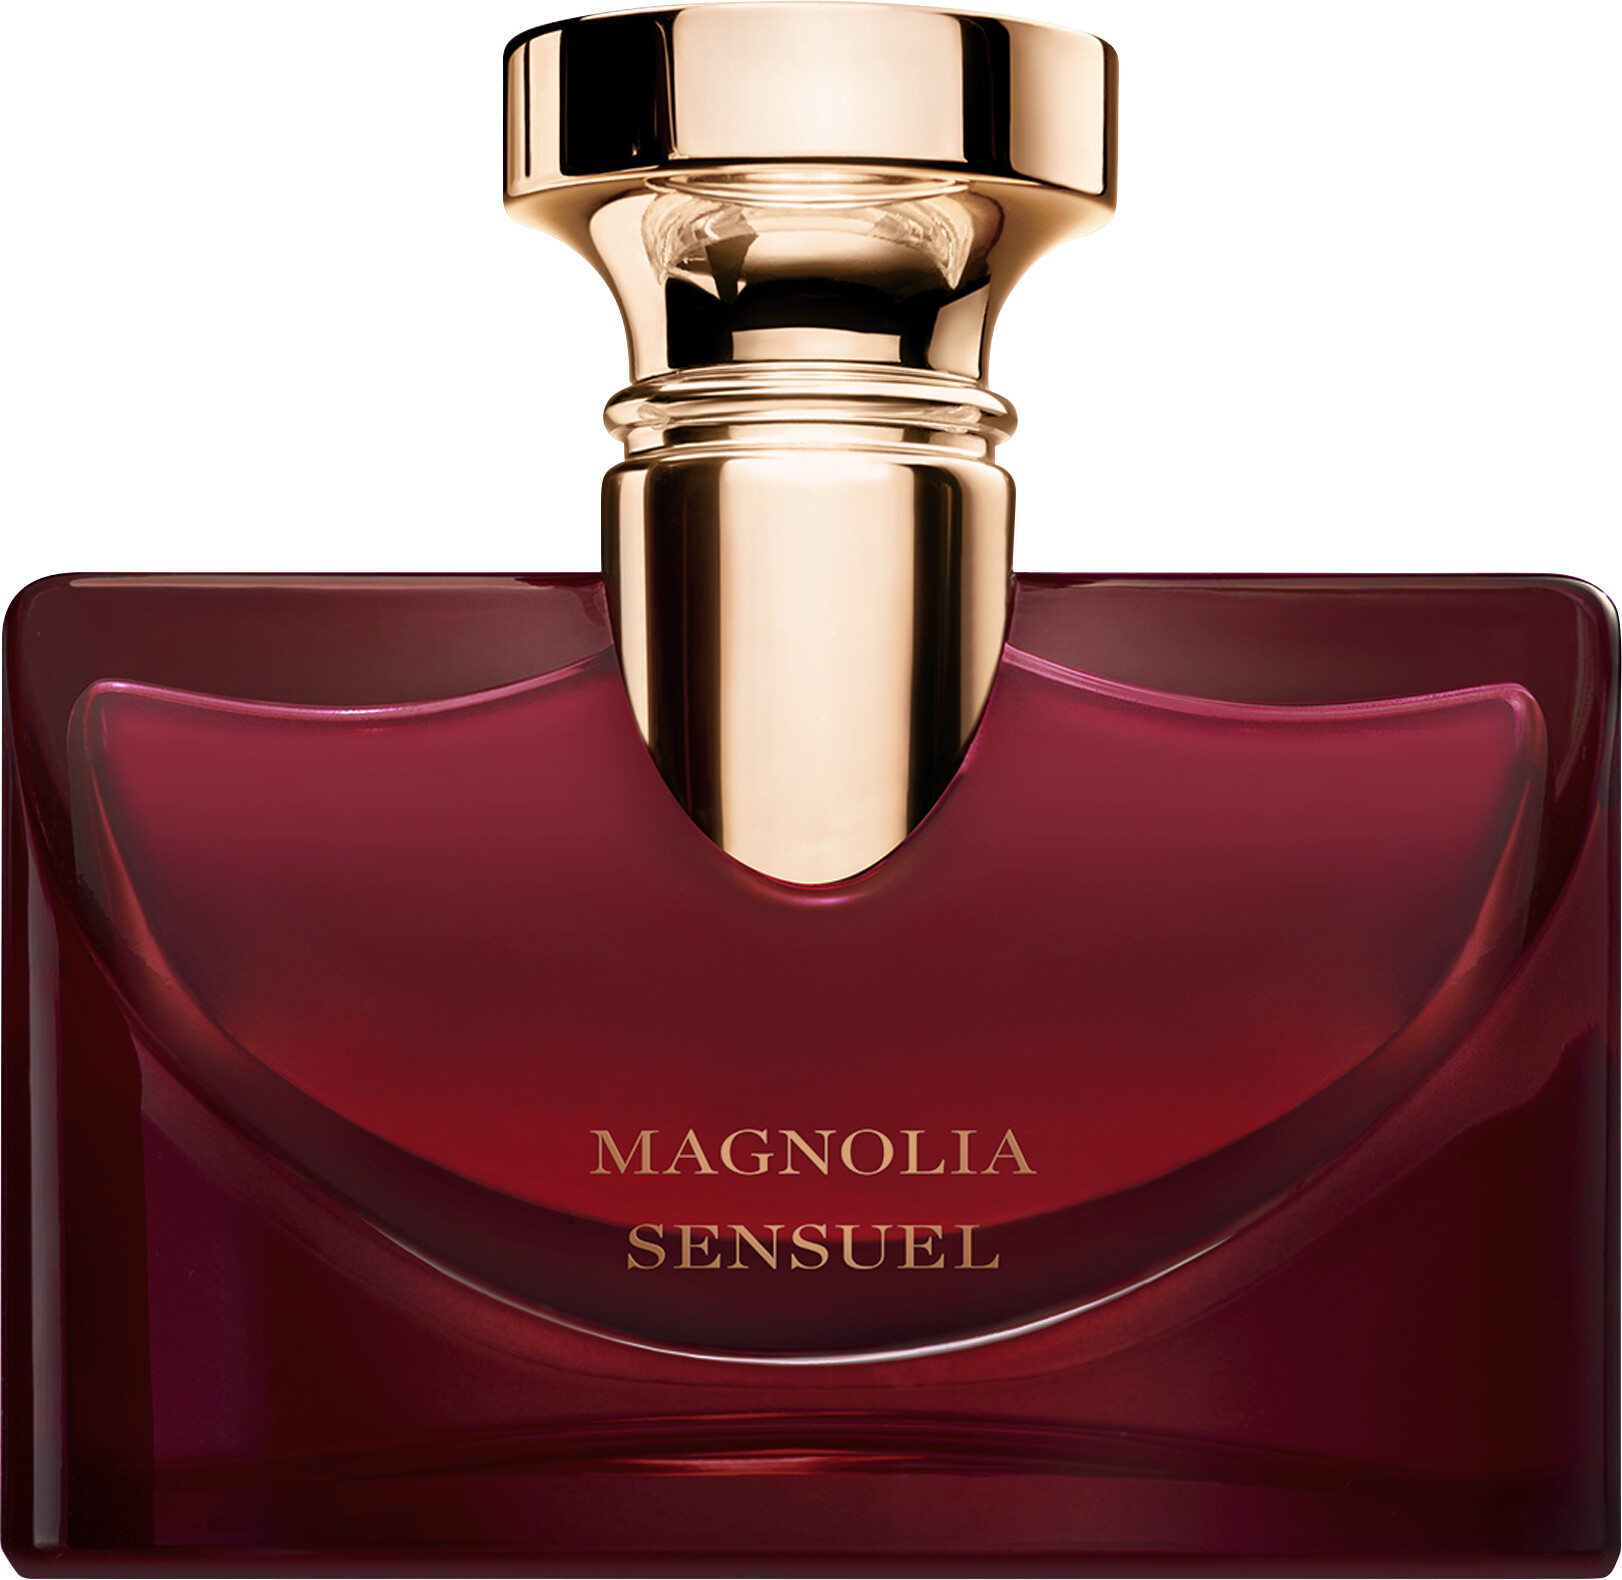 BVLGARI Splendida Magnolia Sensuel Eau de Parfum Spray 100ml 3a5b200951a